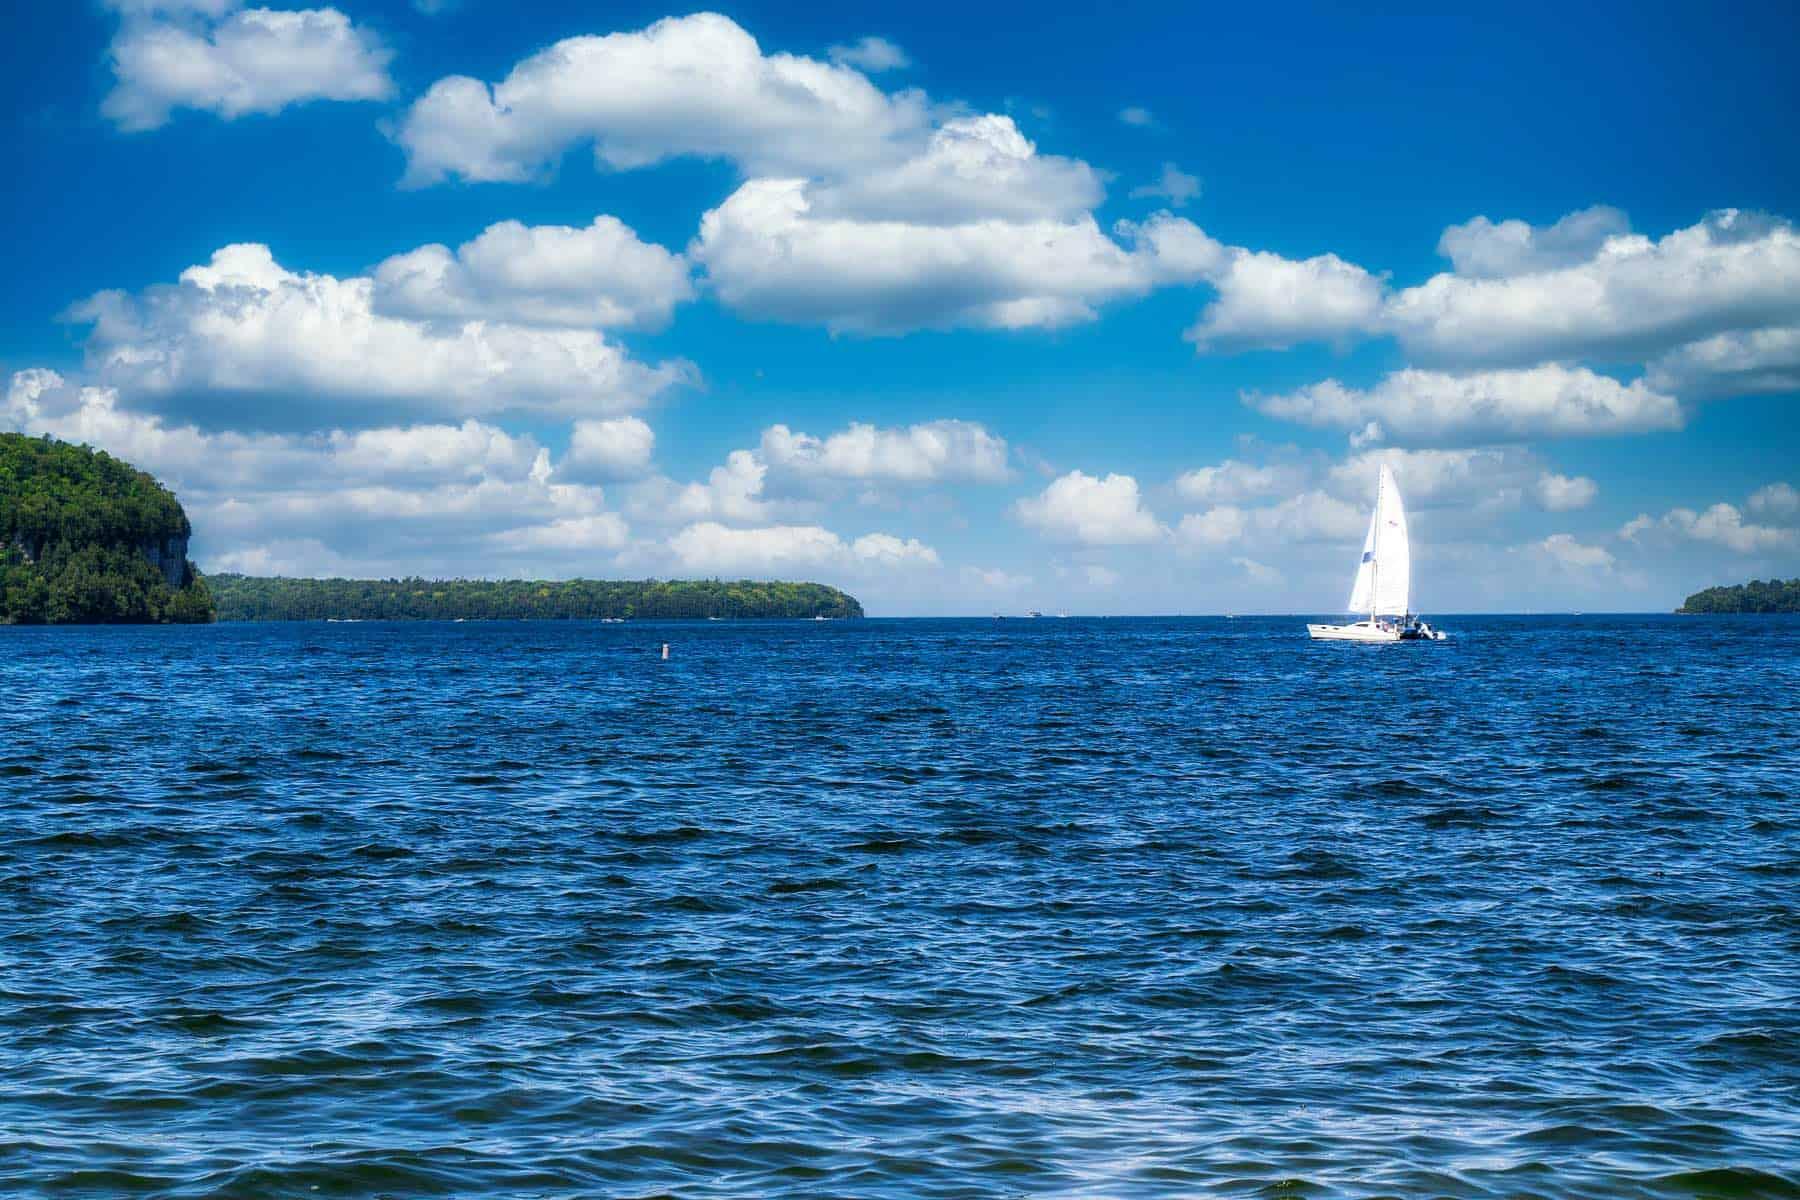 Ephraim Shores Resort beach resorts in Wisconsin